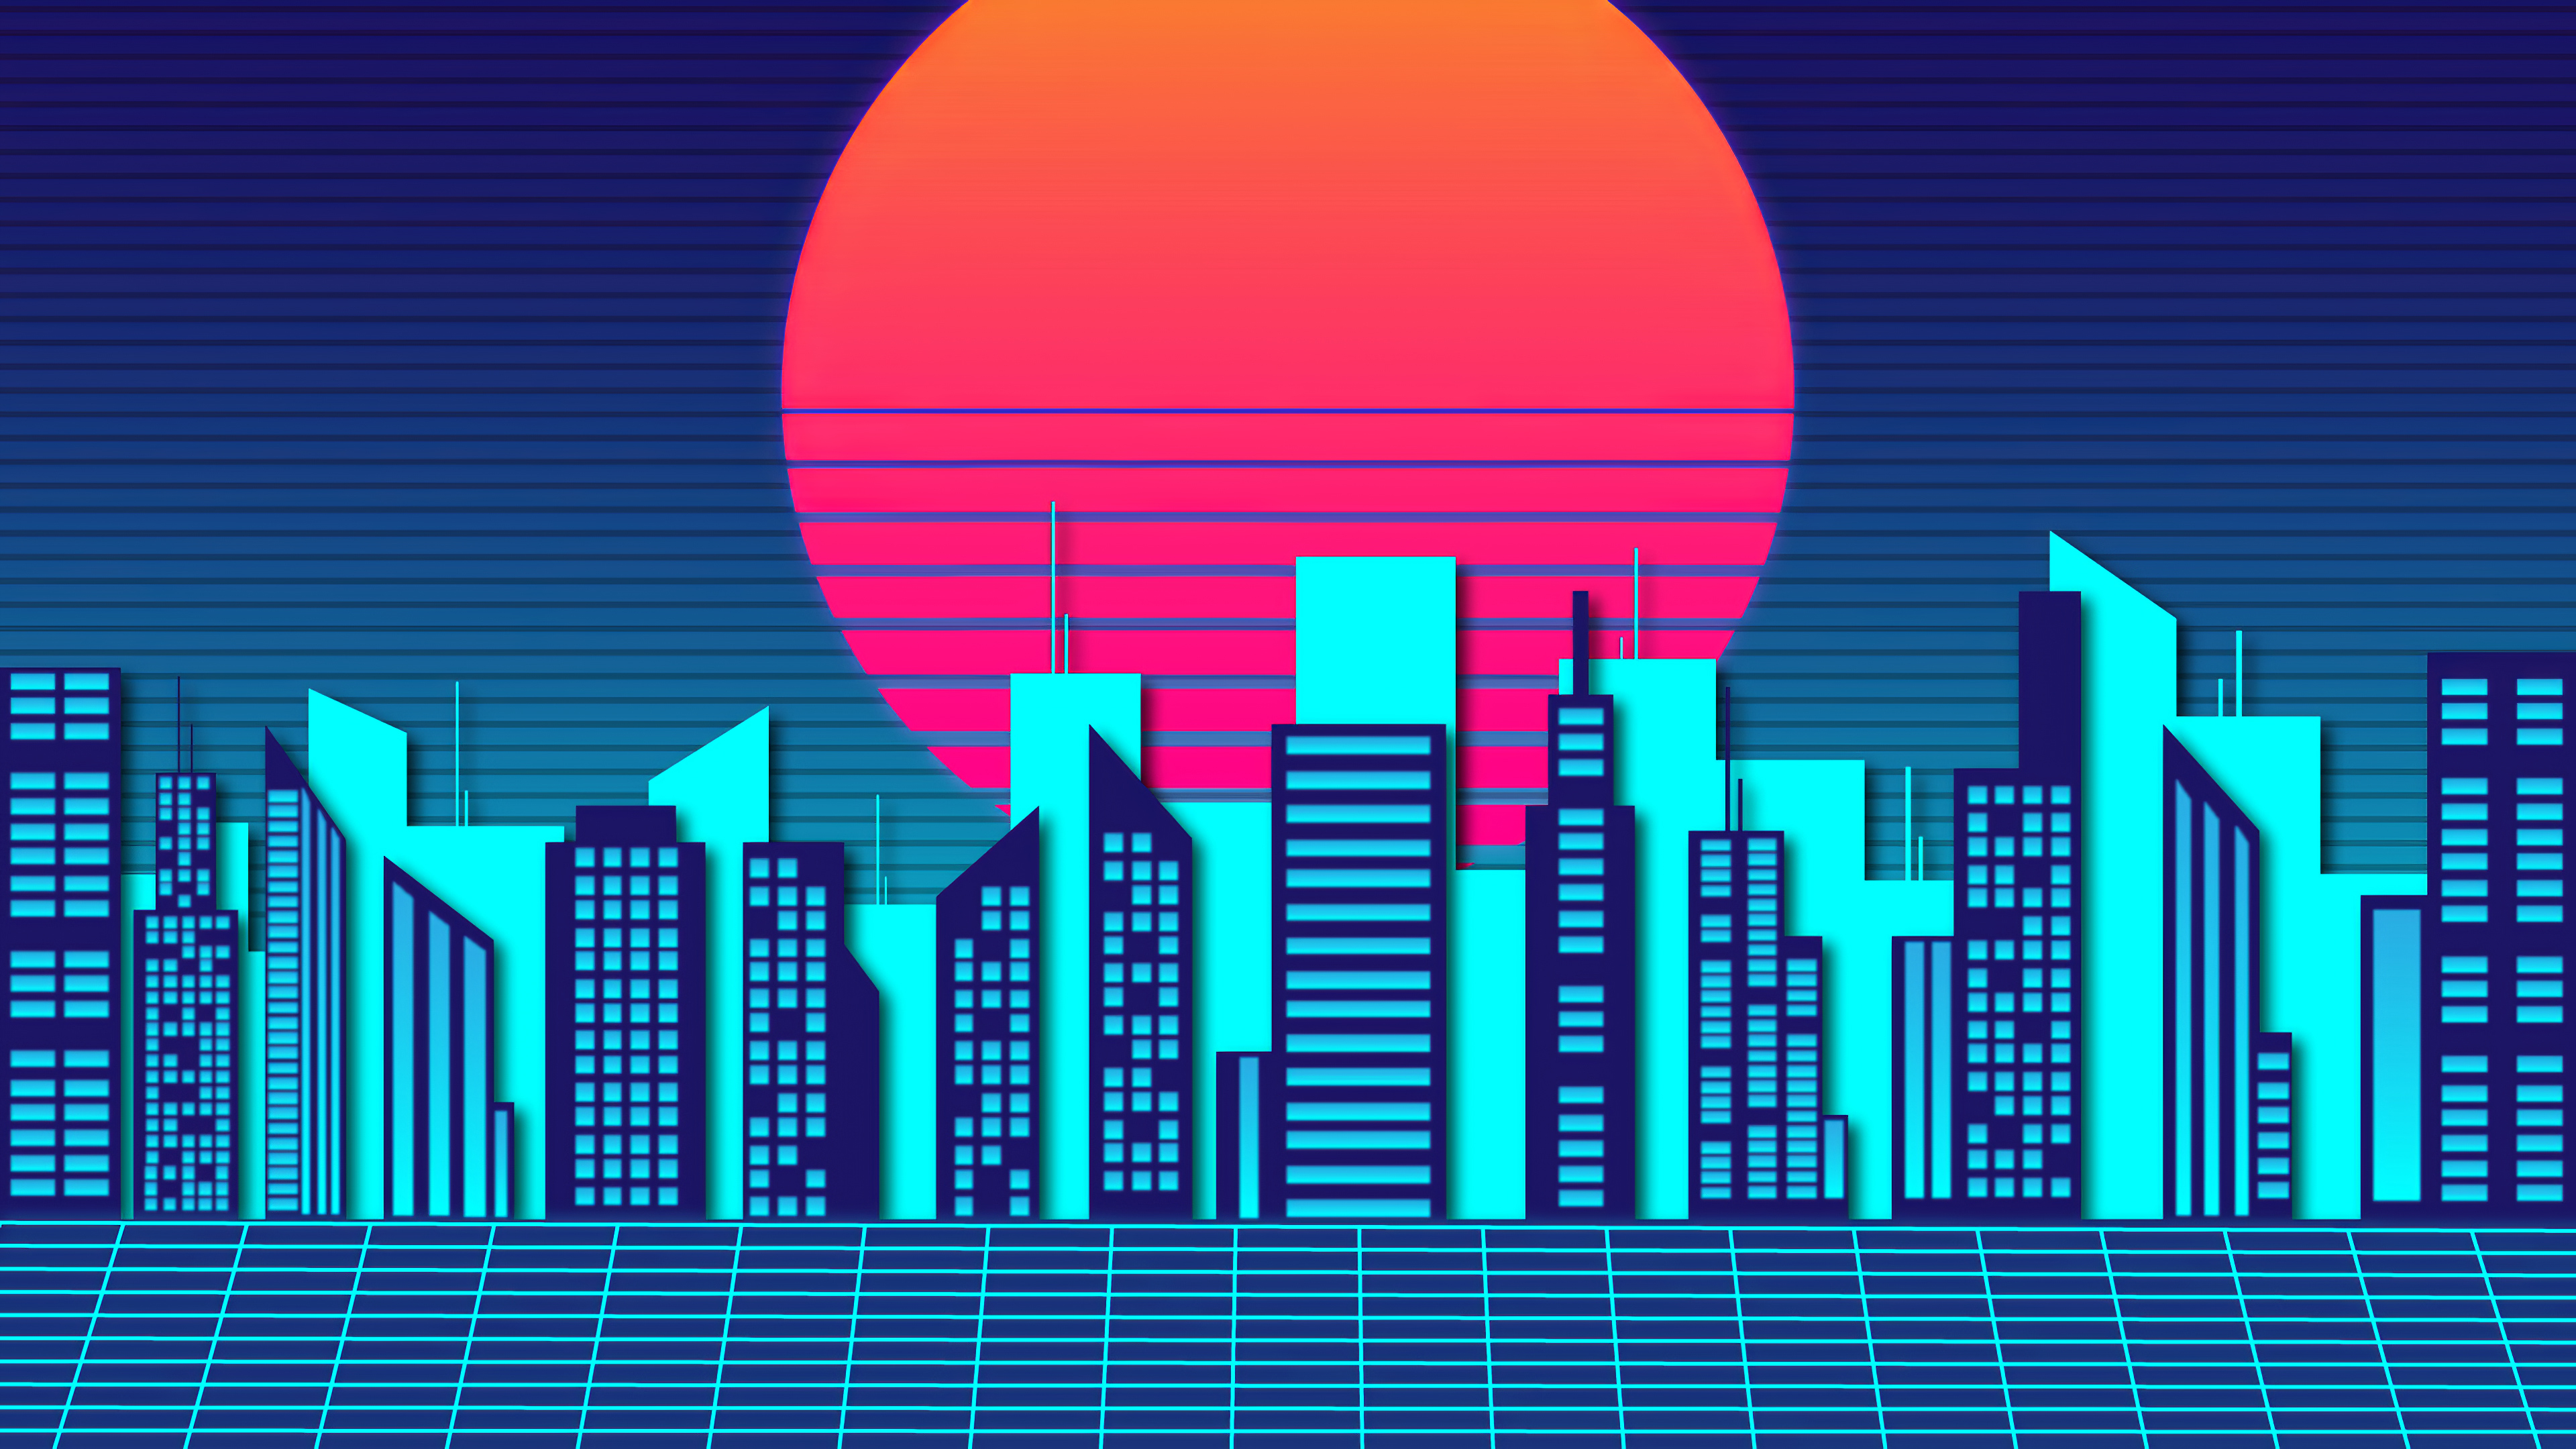 Retro City Wave 4k, HD Artist, 4k ...